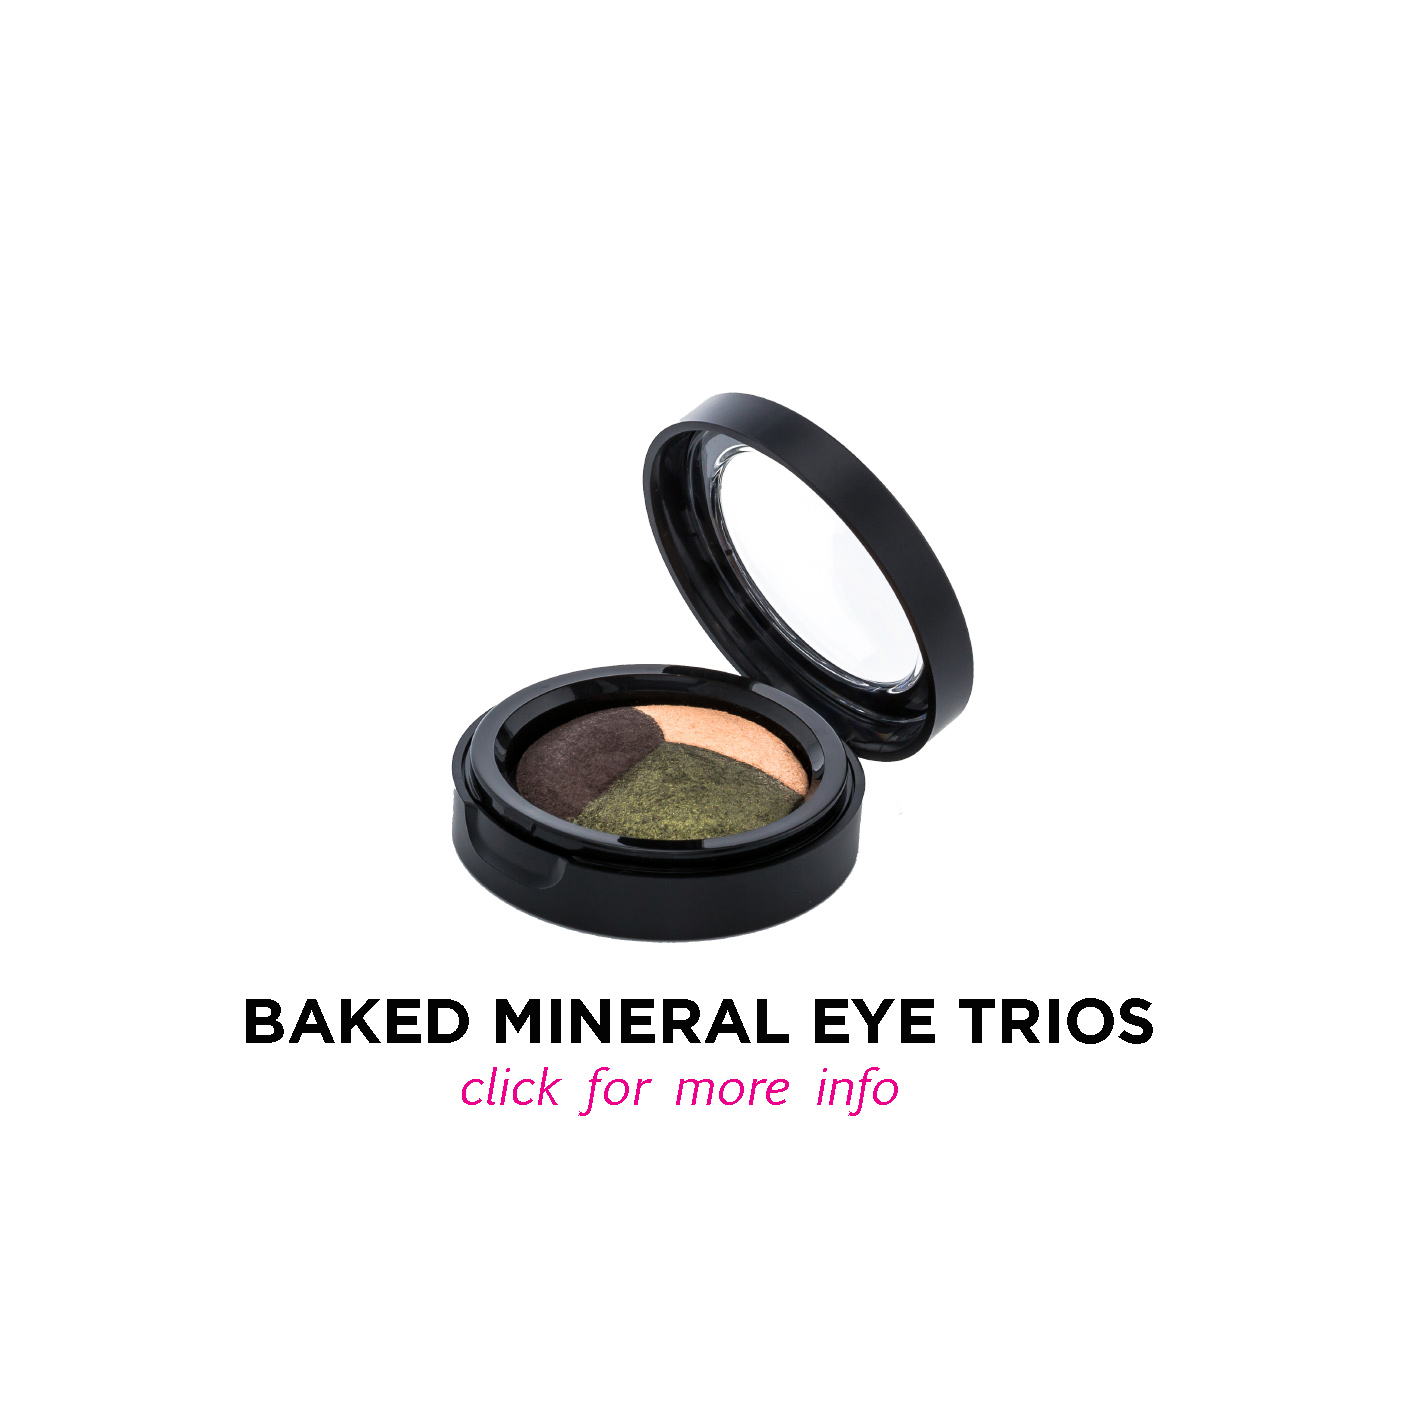 Baked Mineral Eye Trios